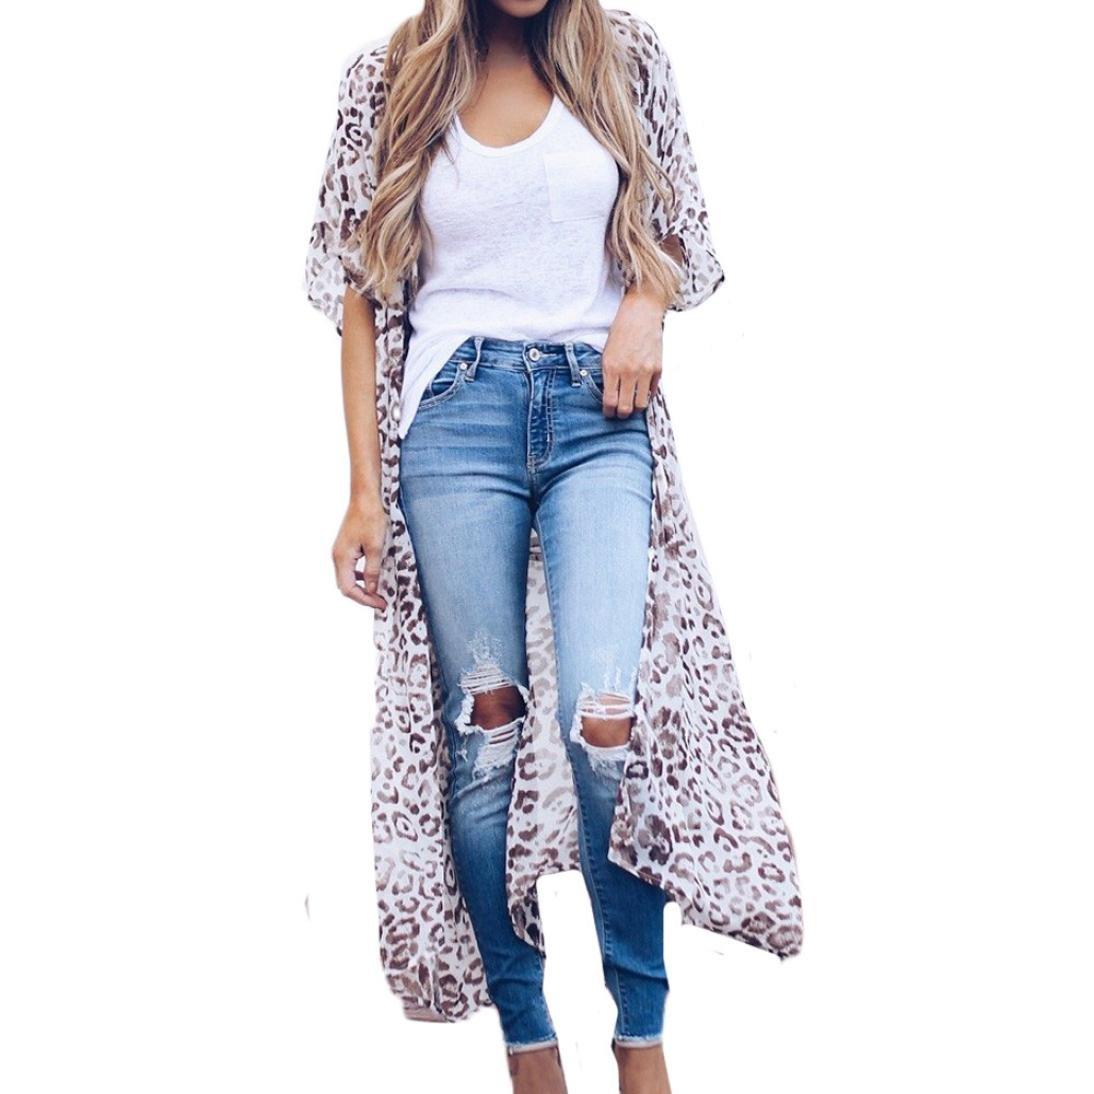 Ladies Women Chiffon Maxi Open Kimono Plain Long Sleeve Style Dress Outwear Tops